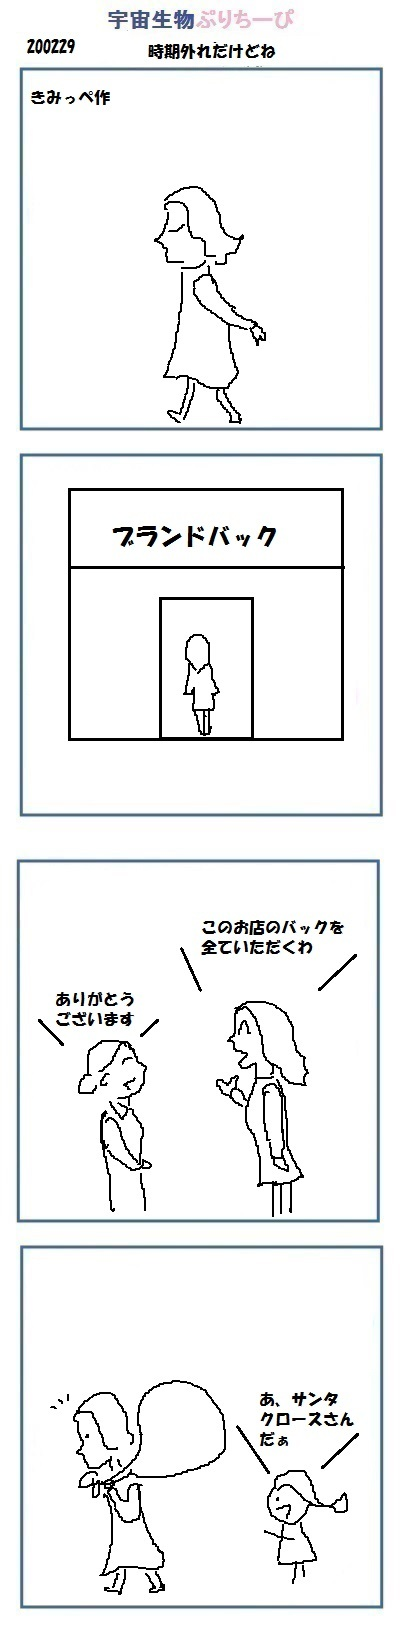 200229_mpry.jpg